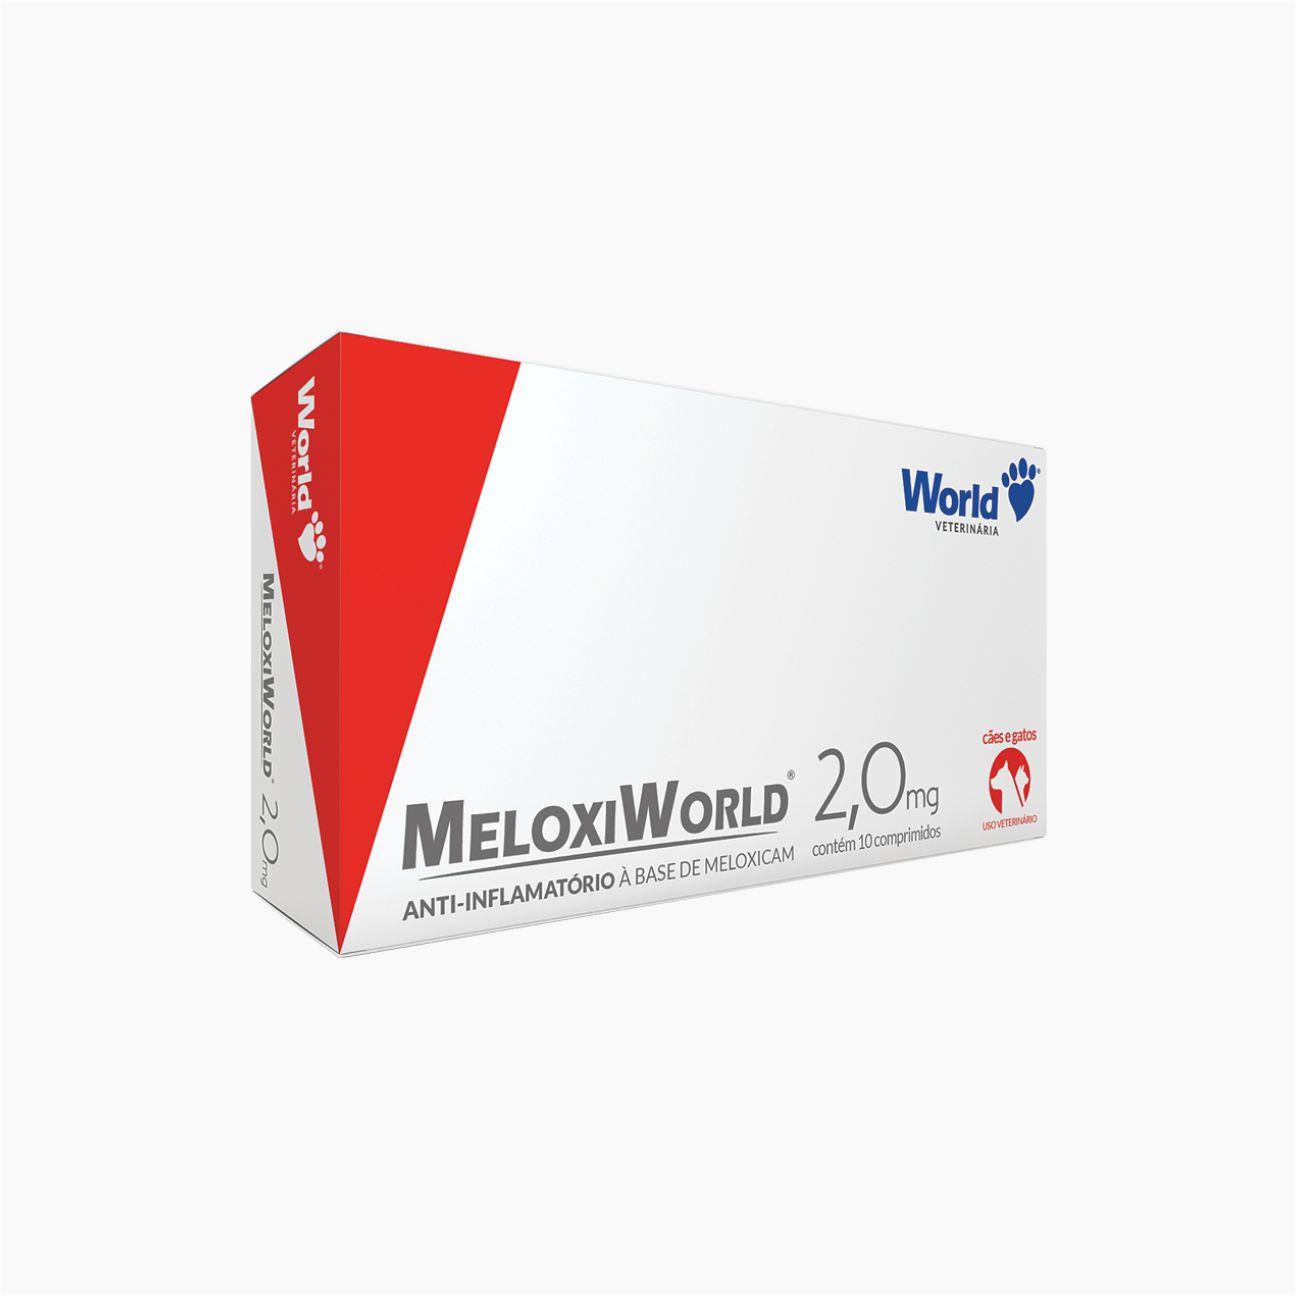 MeloxiWorld 2,0mg